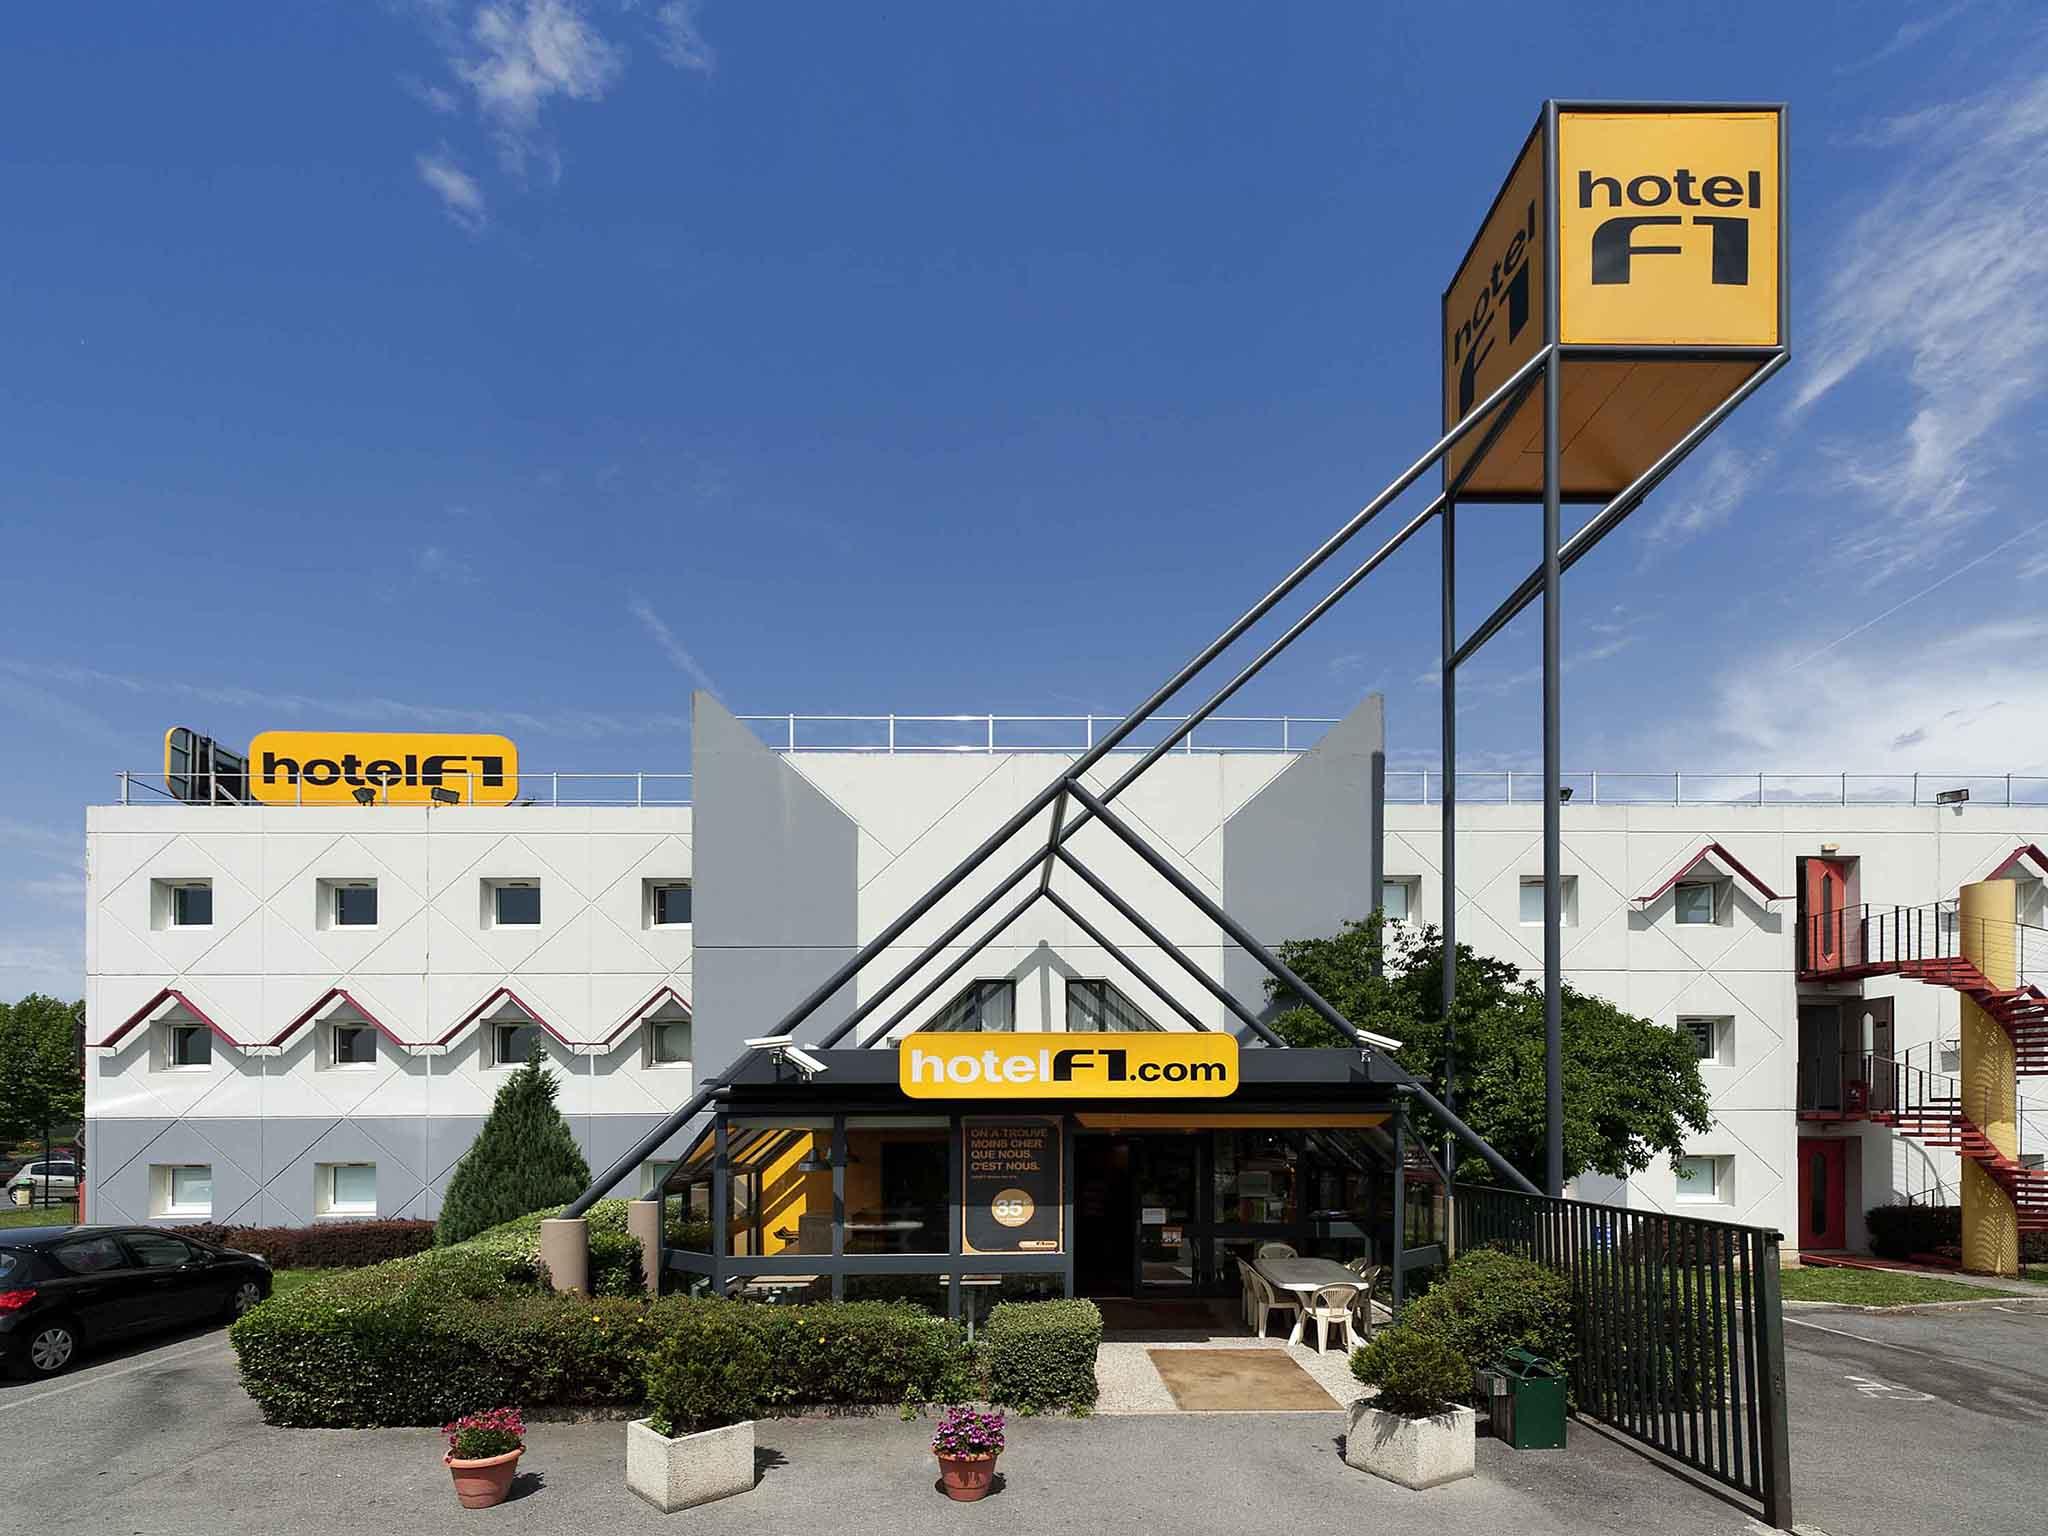 ホテル – hotelF1 Sochaux Montbéliard